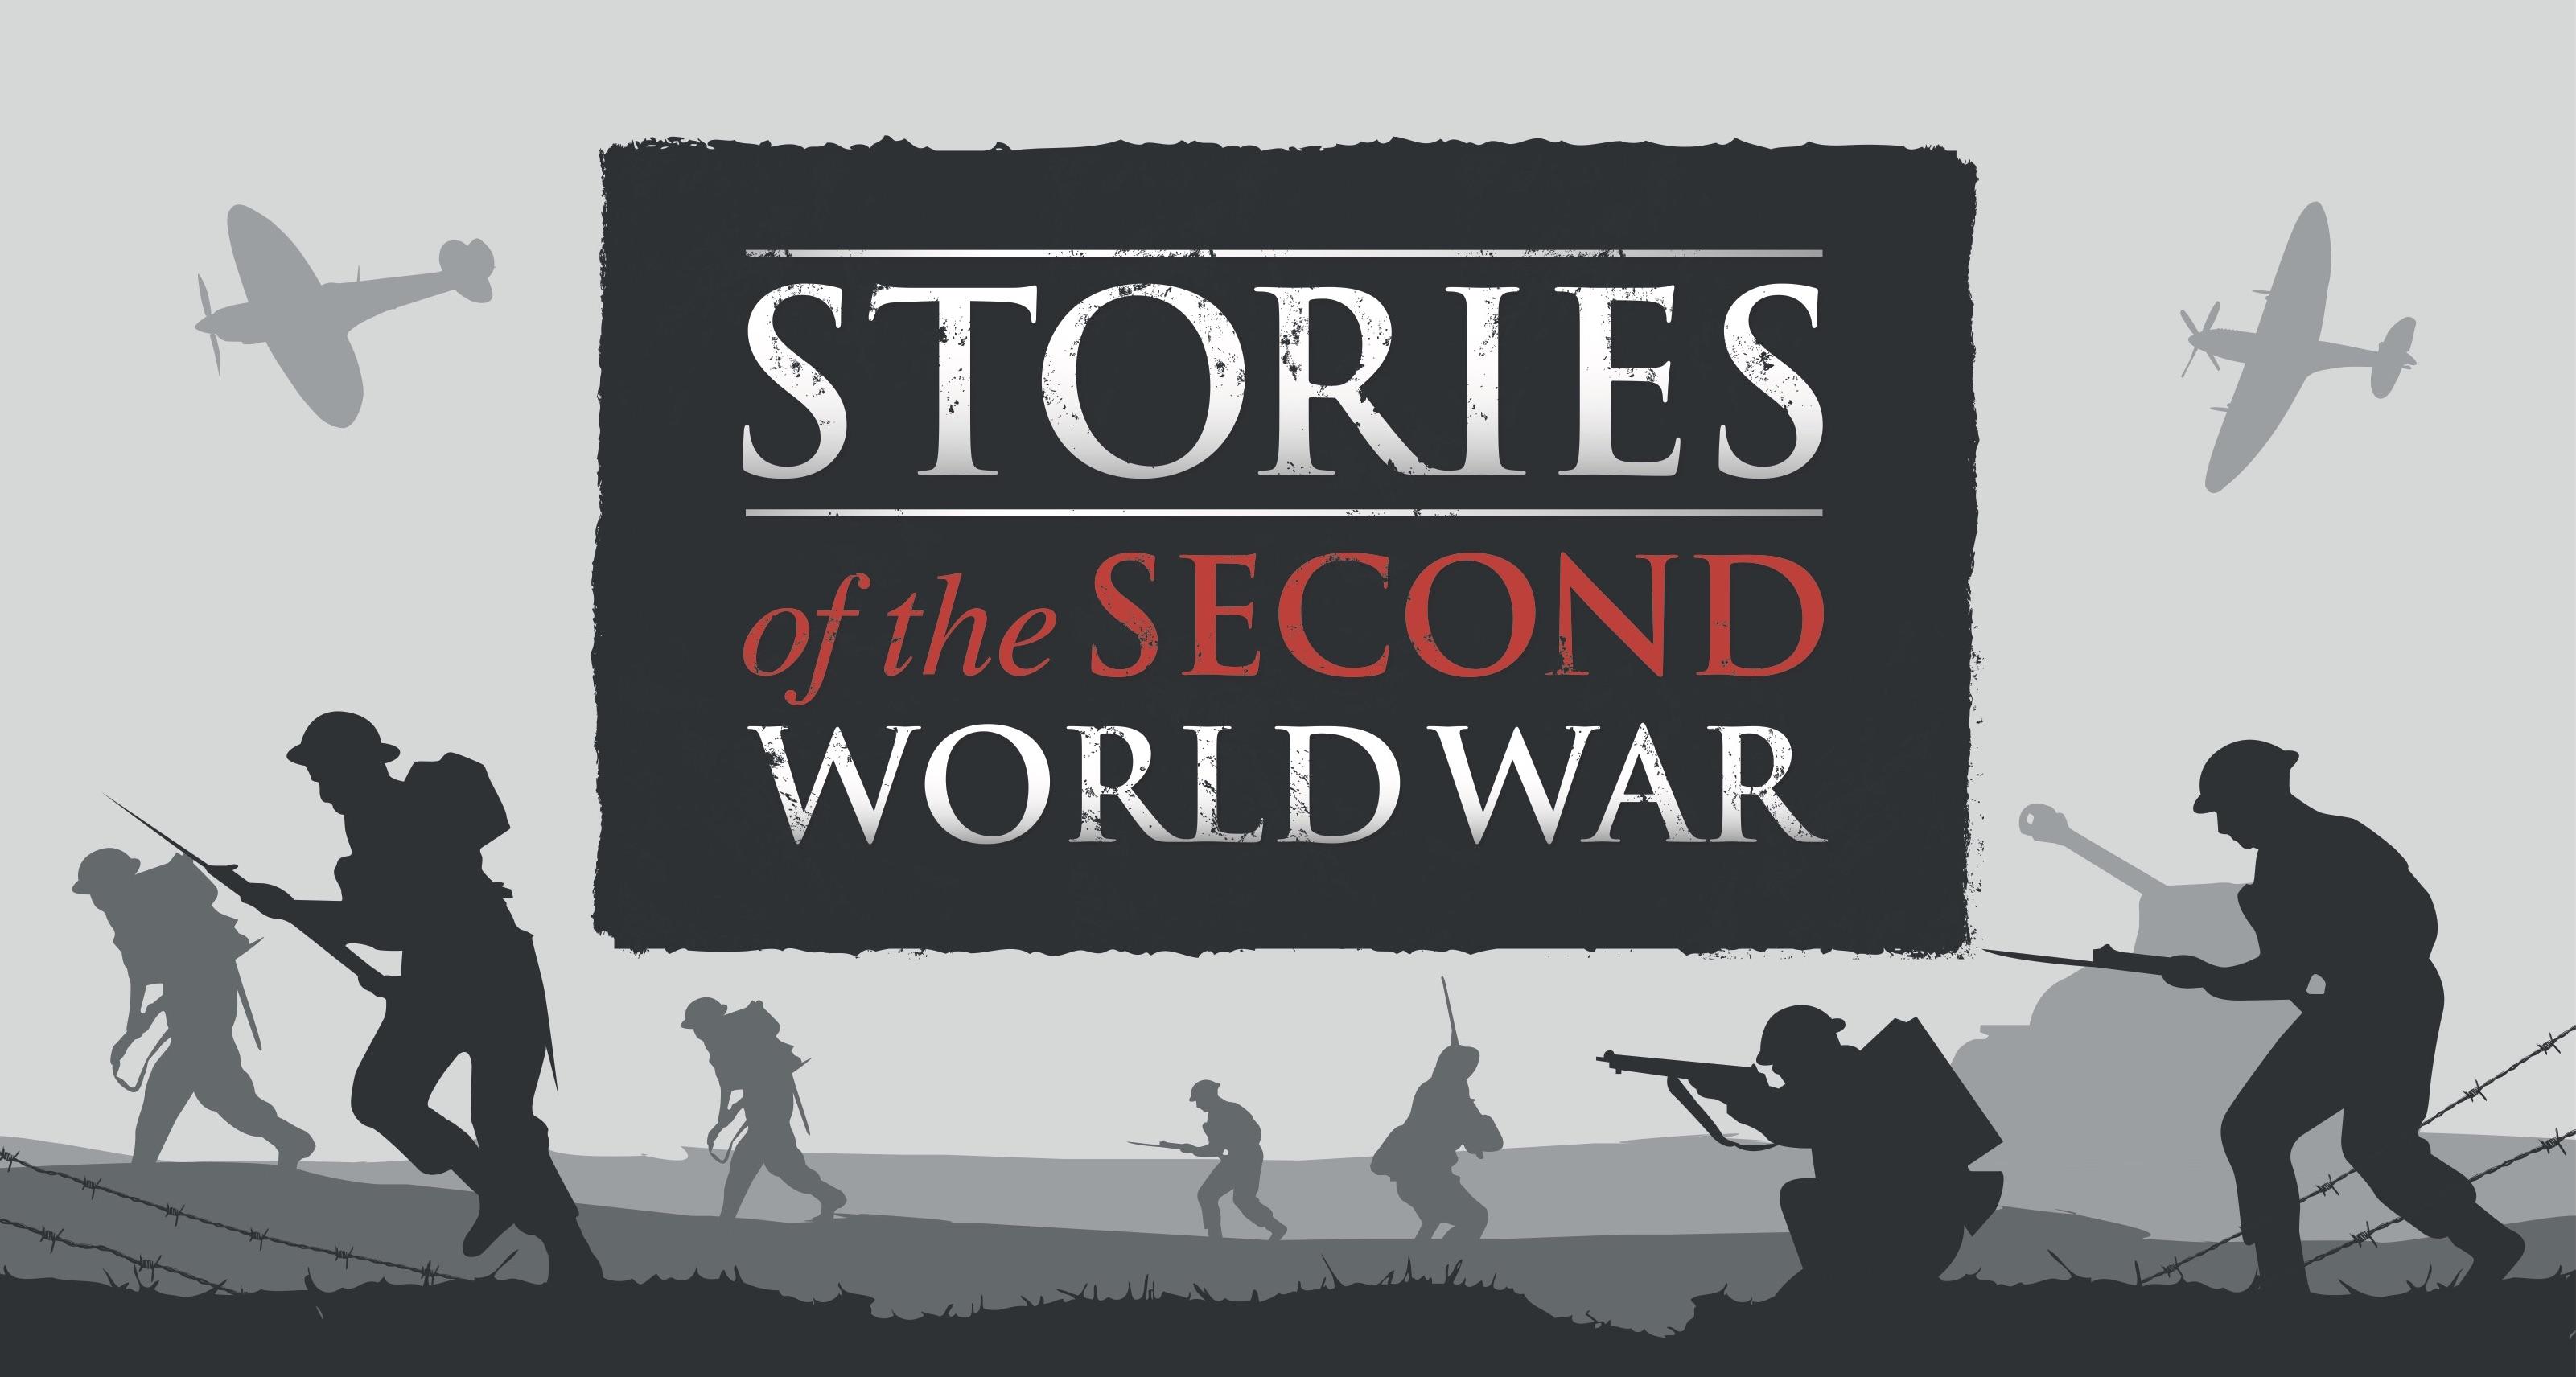 Stories of ww2 artwork header